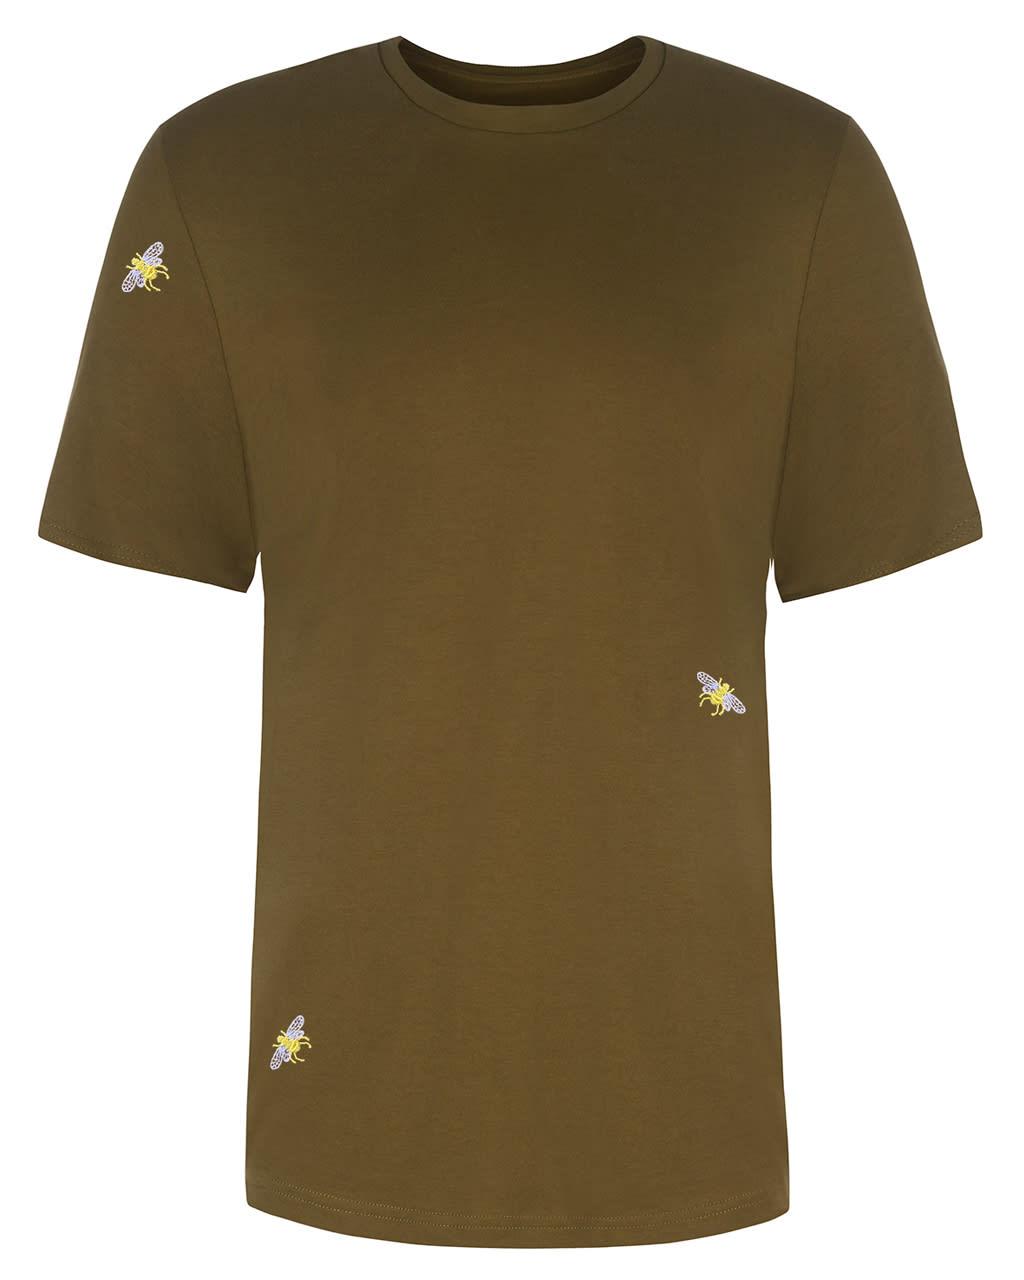 Bee Embroidered T-Shirt Khaki